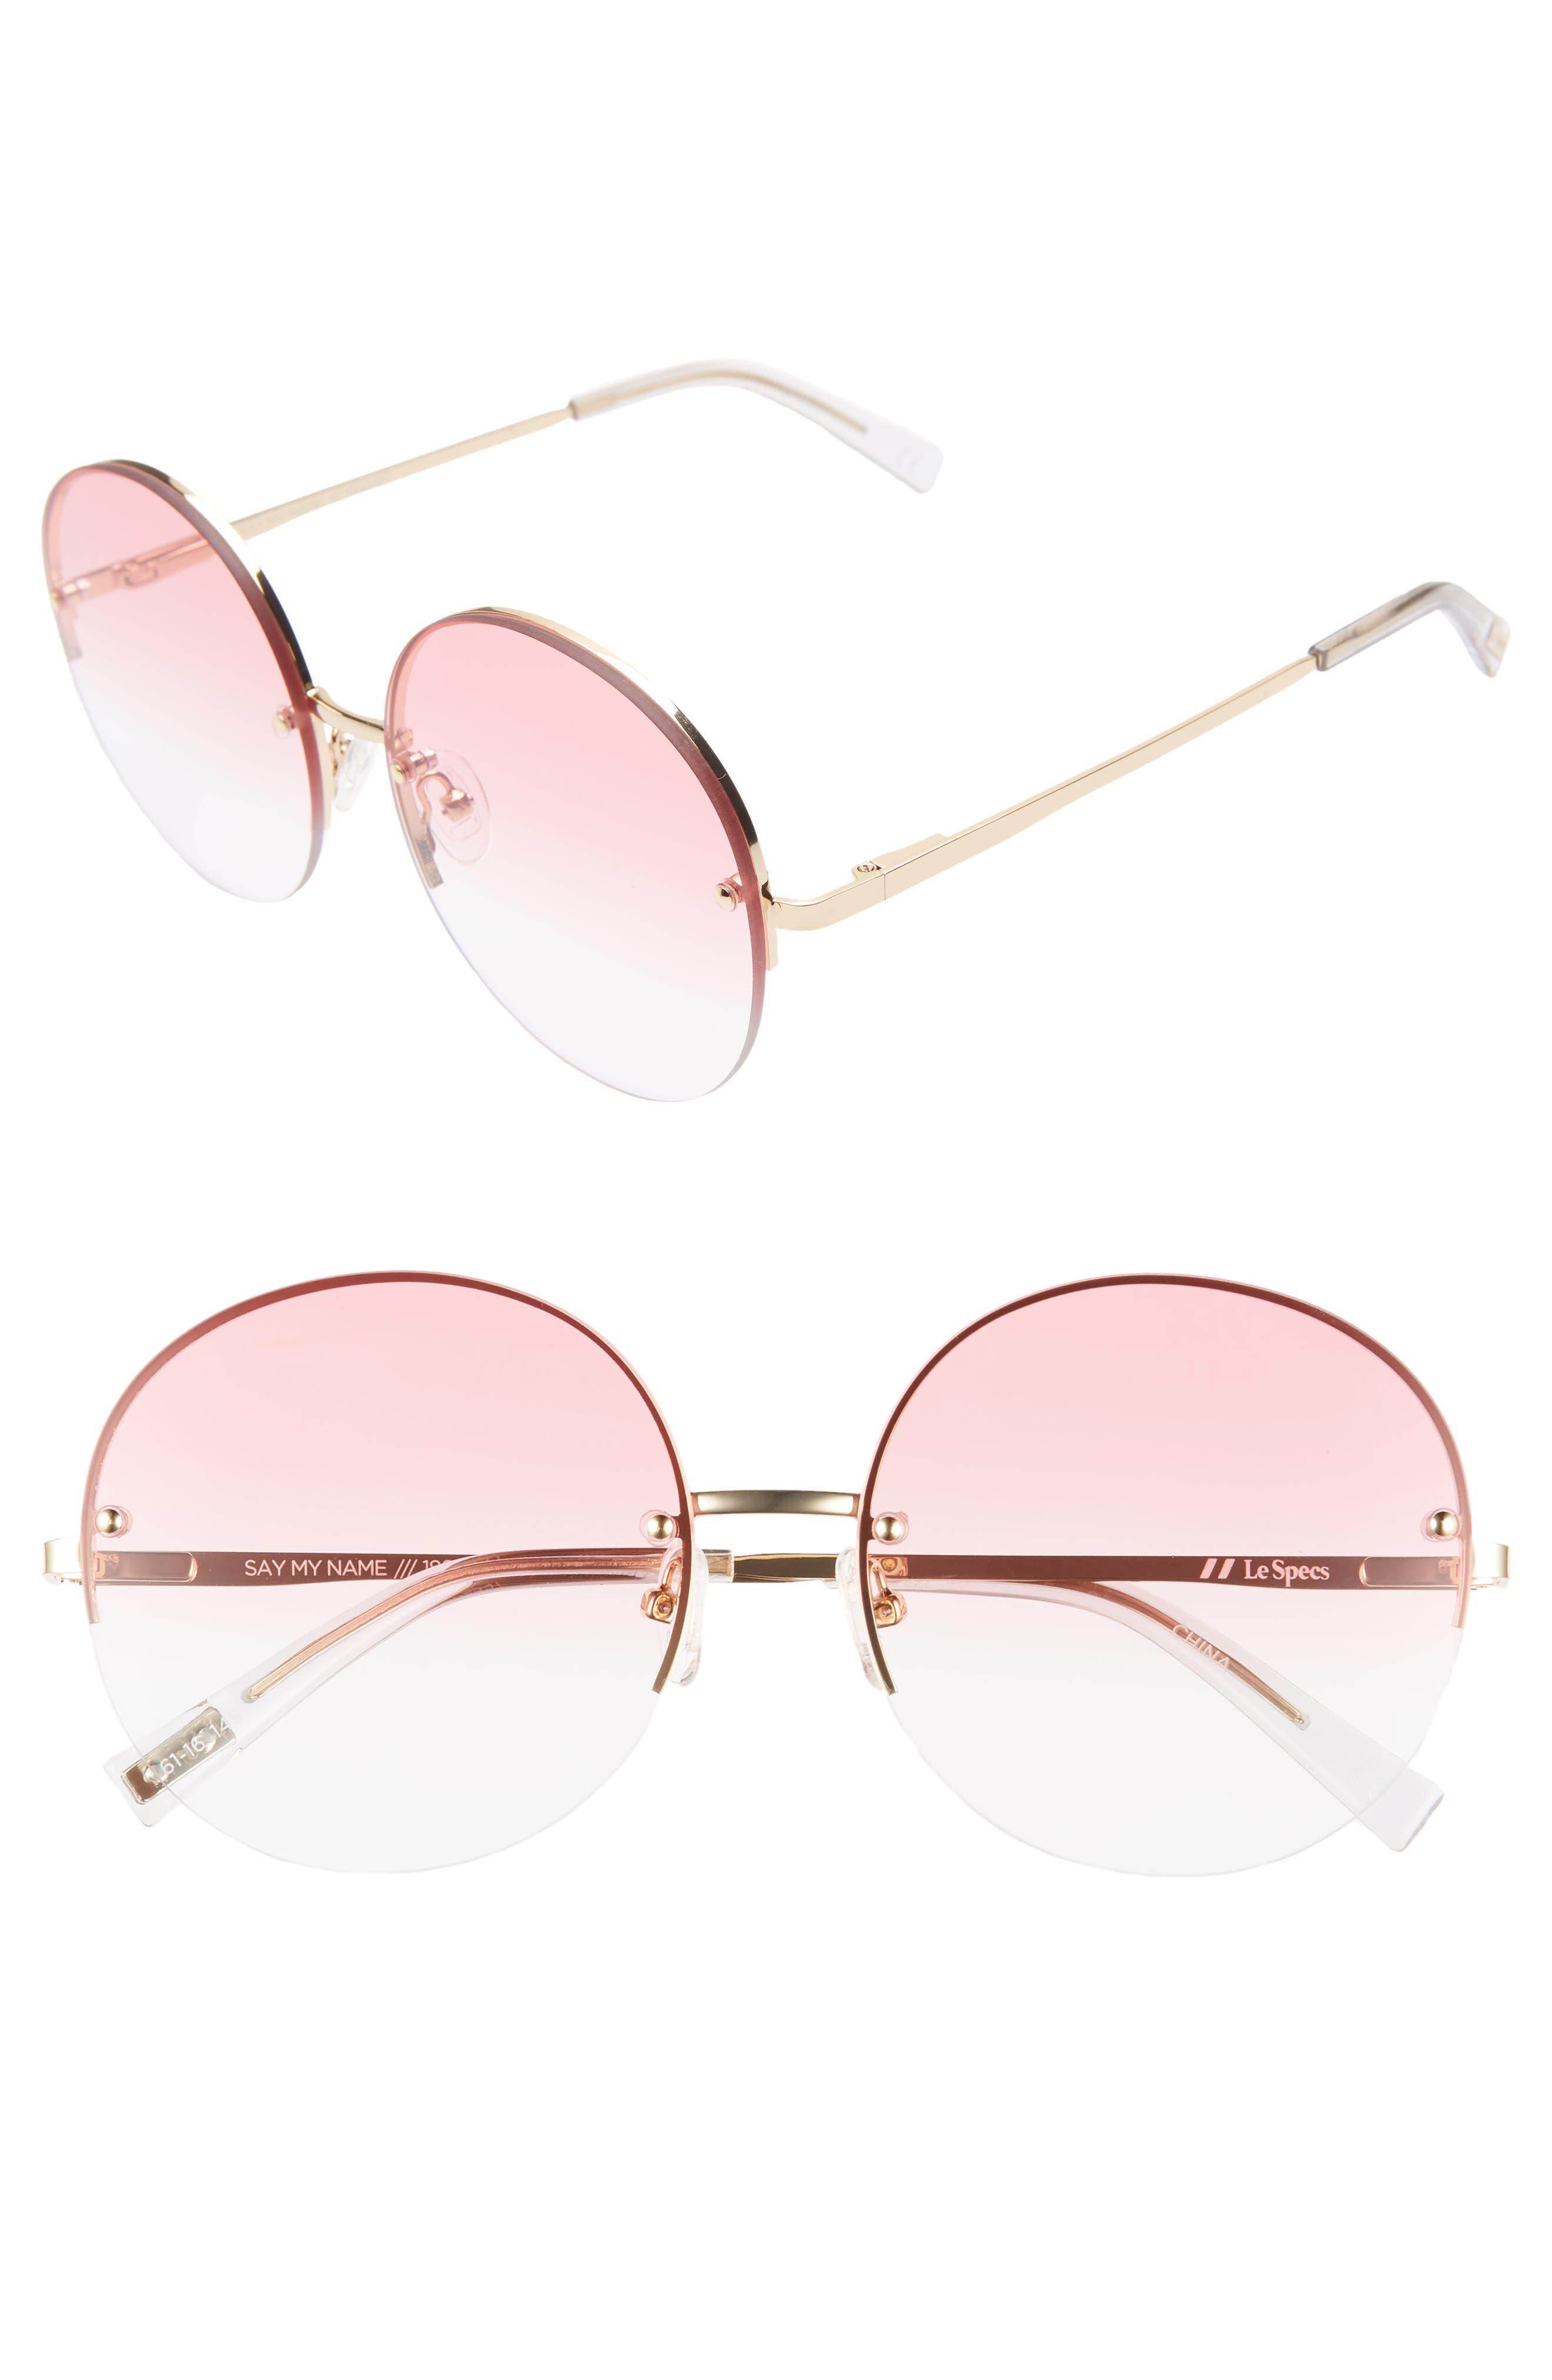 Le Specs Say My Name 61Mm Semi Rimless Round Sunglasses - Bright Gold